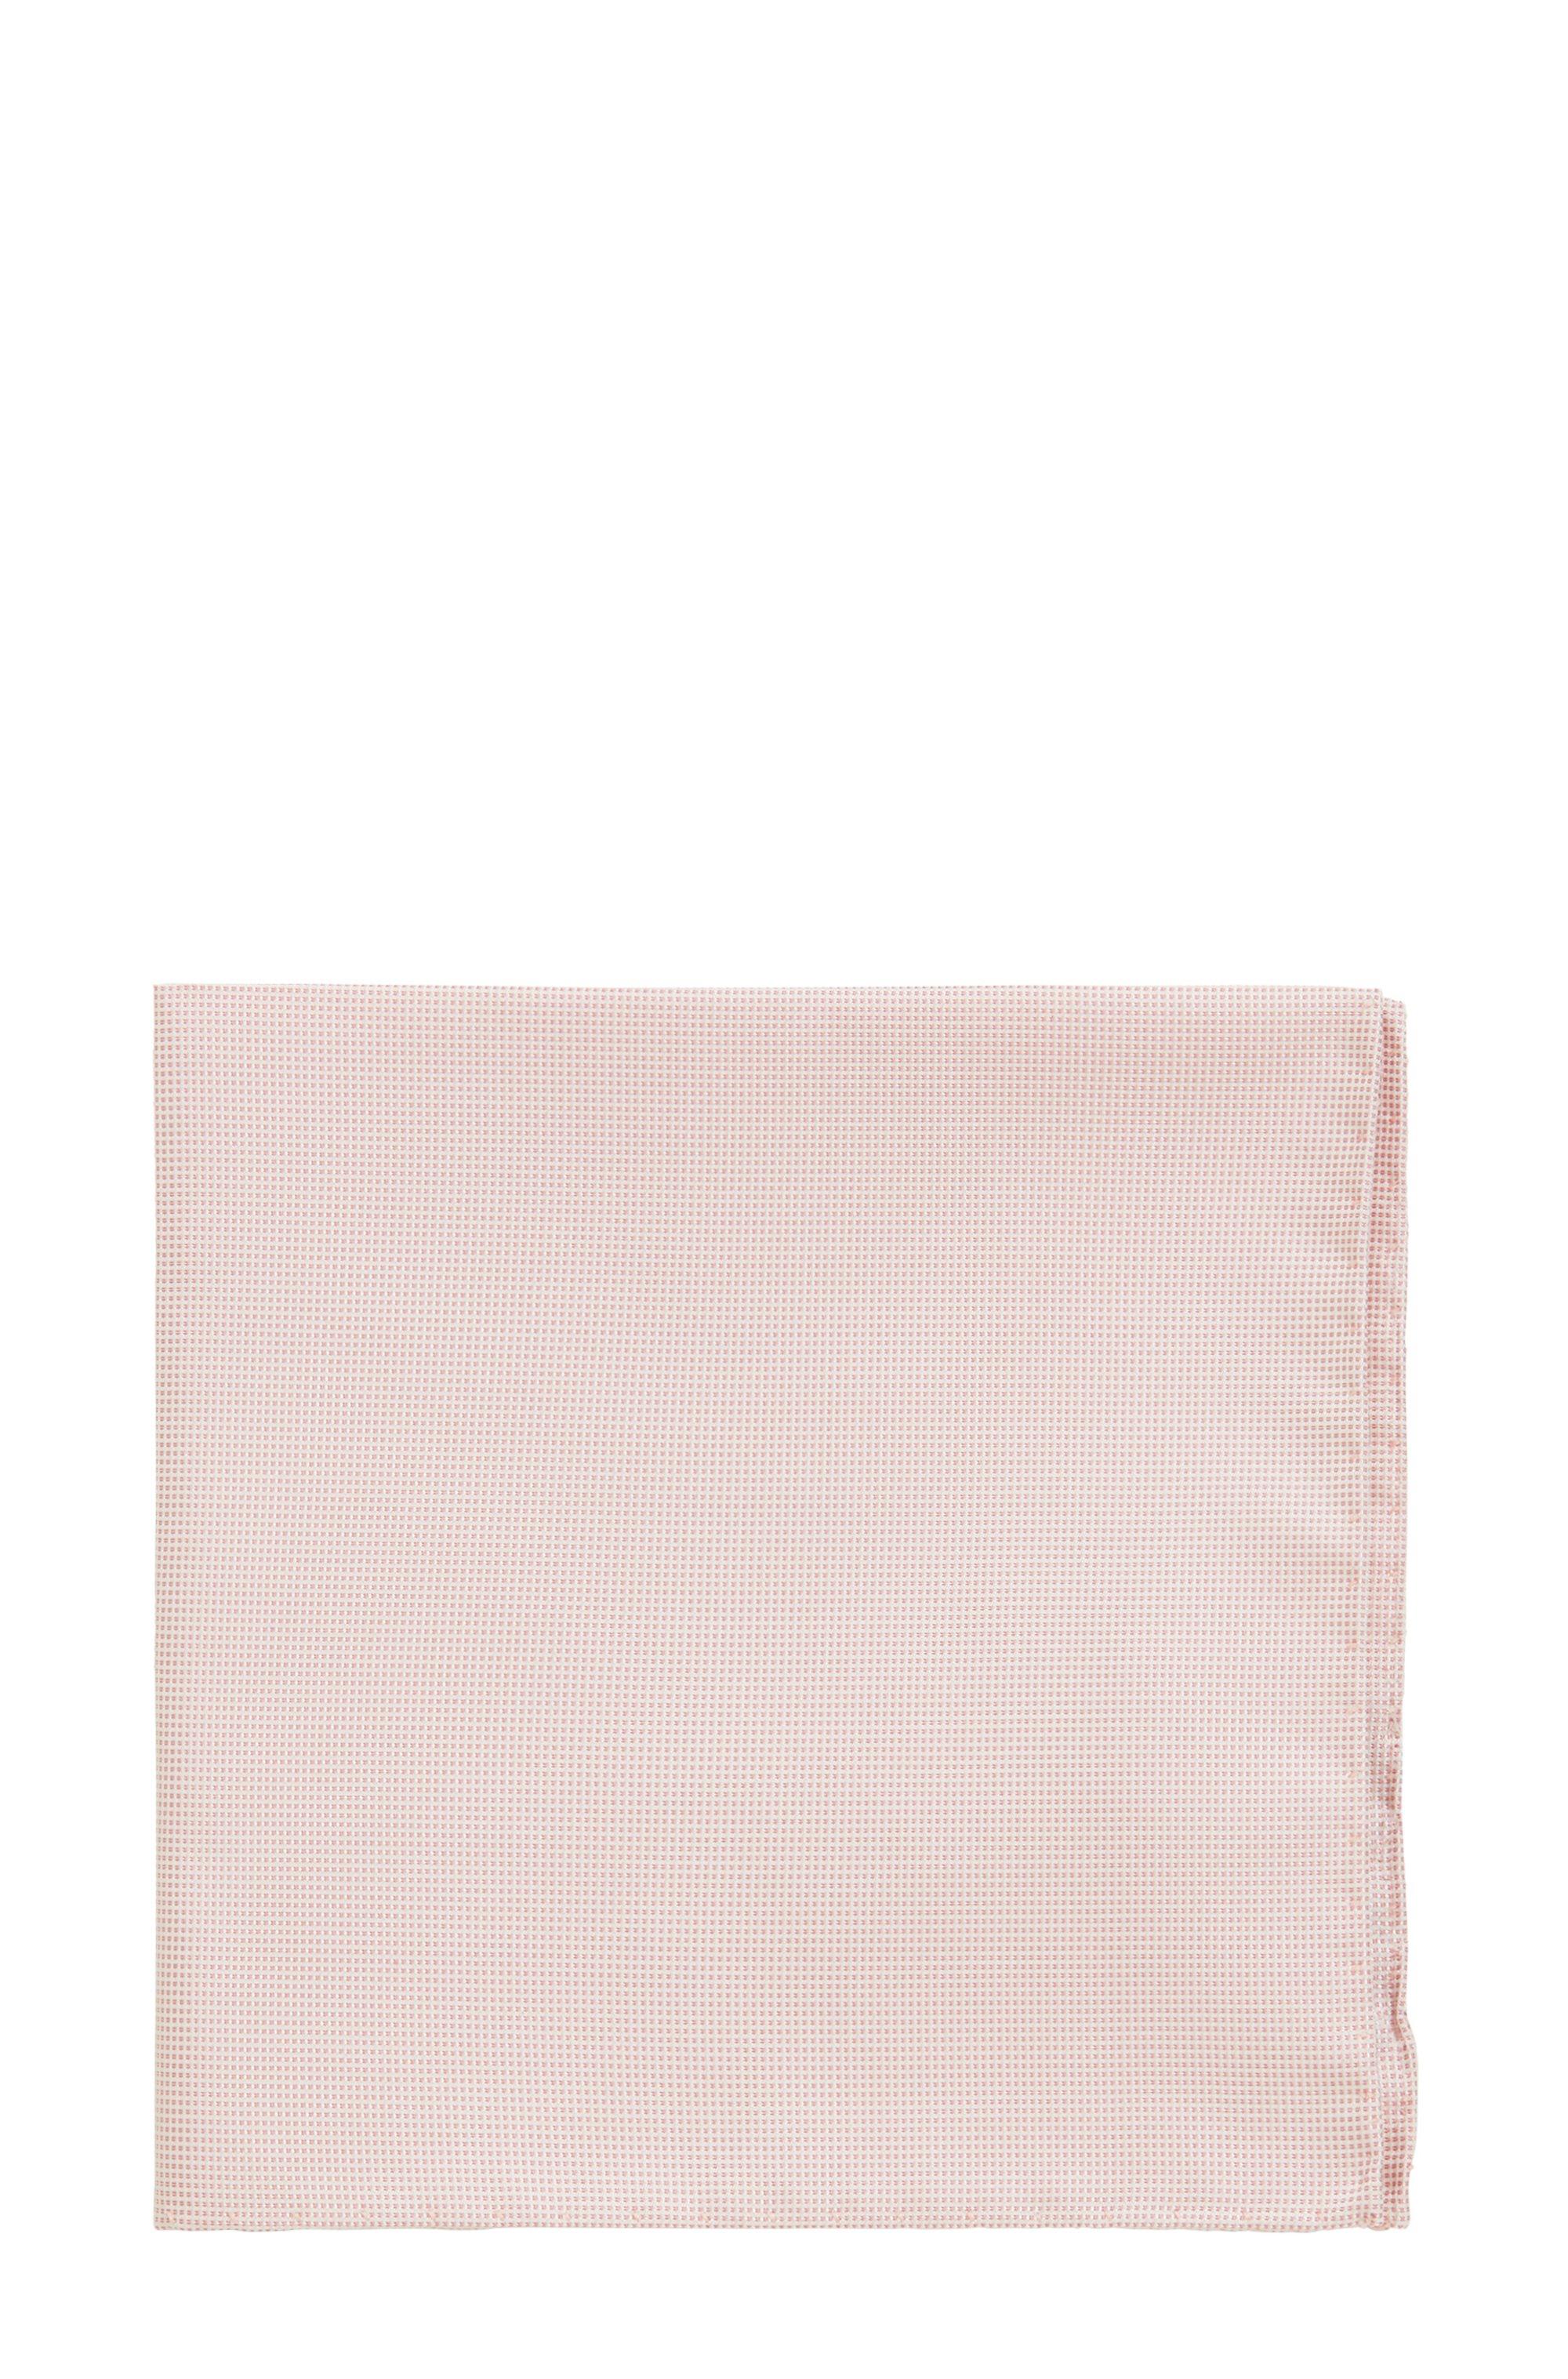 Silk-jacquard pocket square with micro pattern, light pink